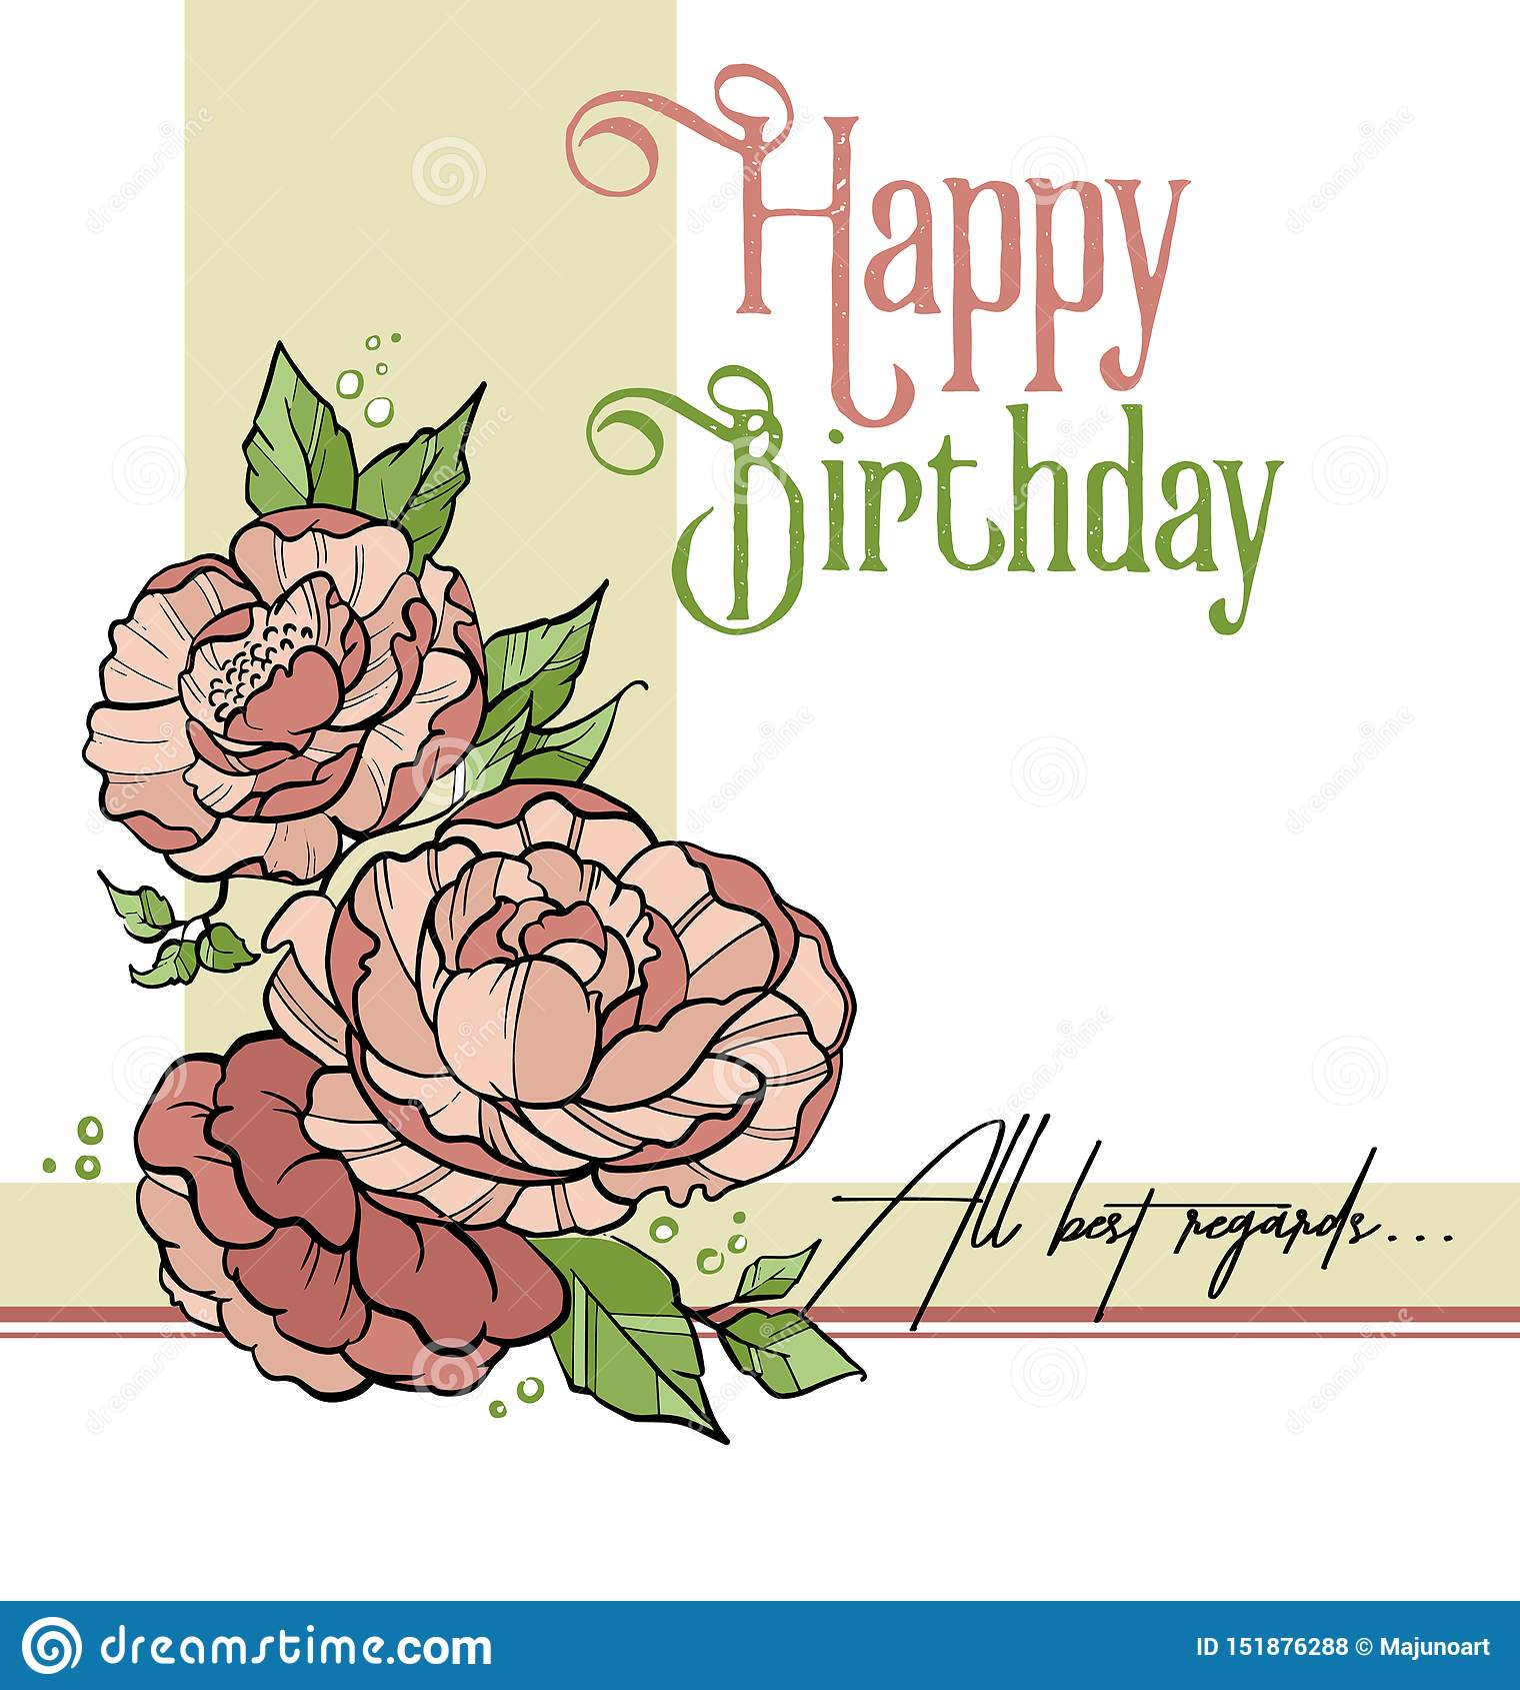 Birthday flycard